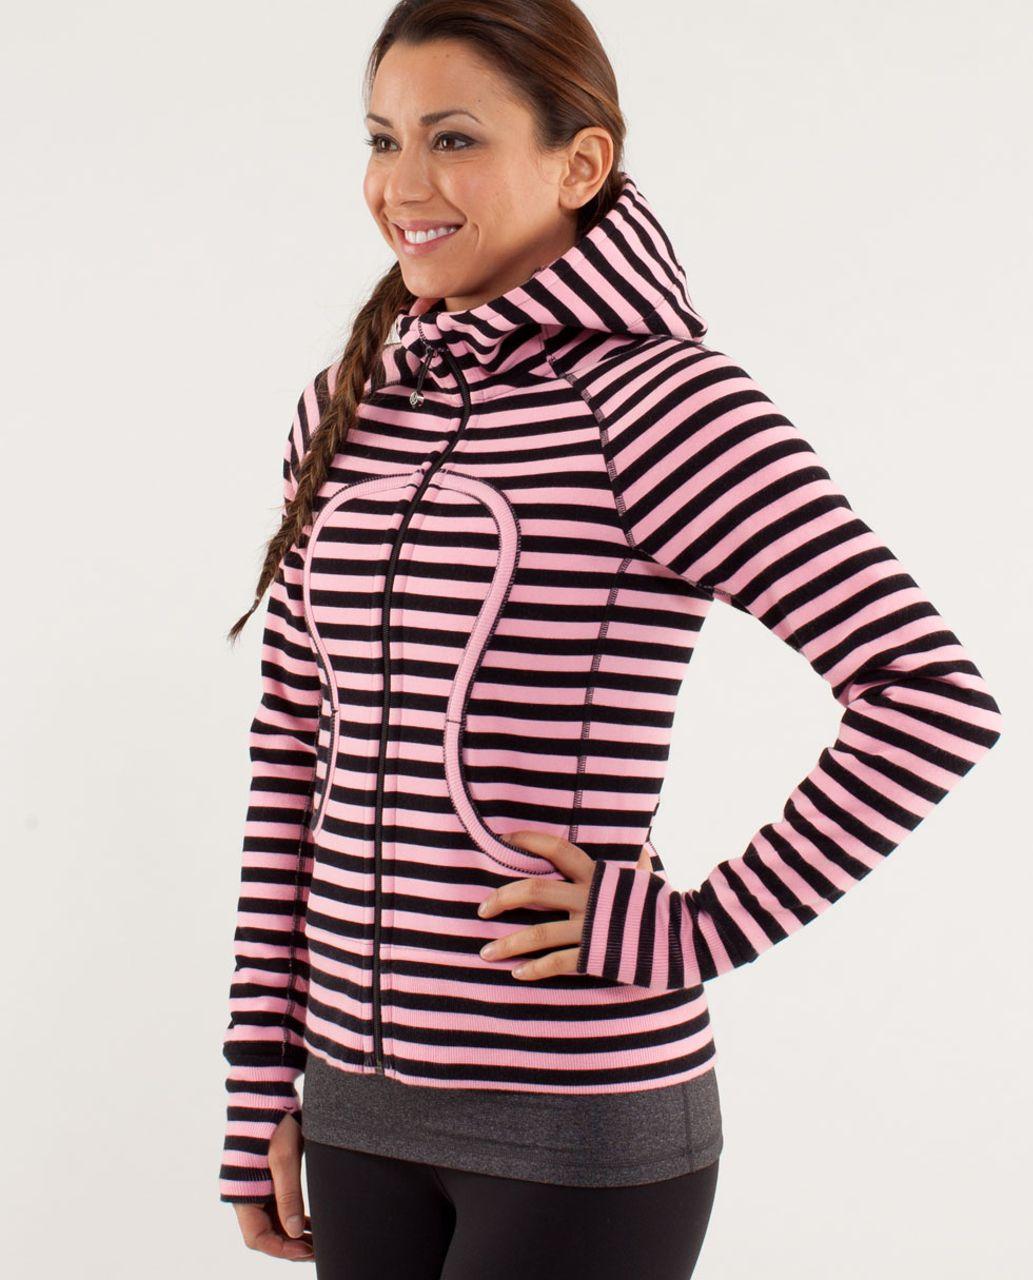 Lululemon Scuba Hoodie *Stretch - Sea Stripe Pink Shell Black